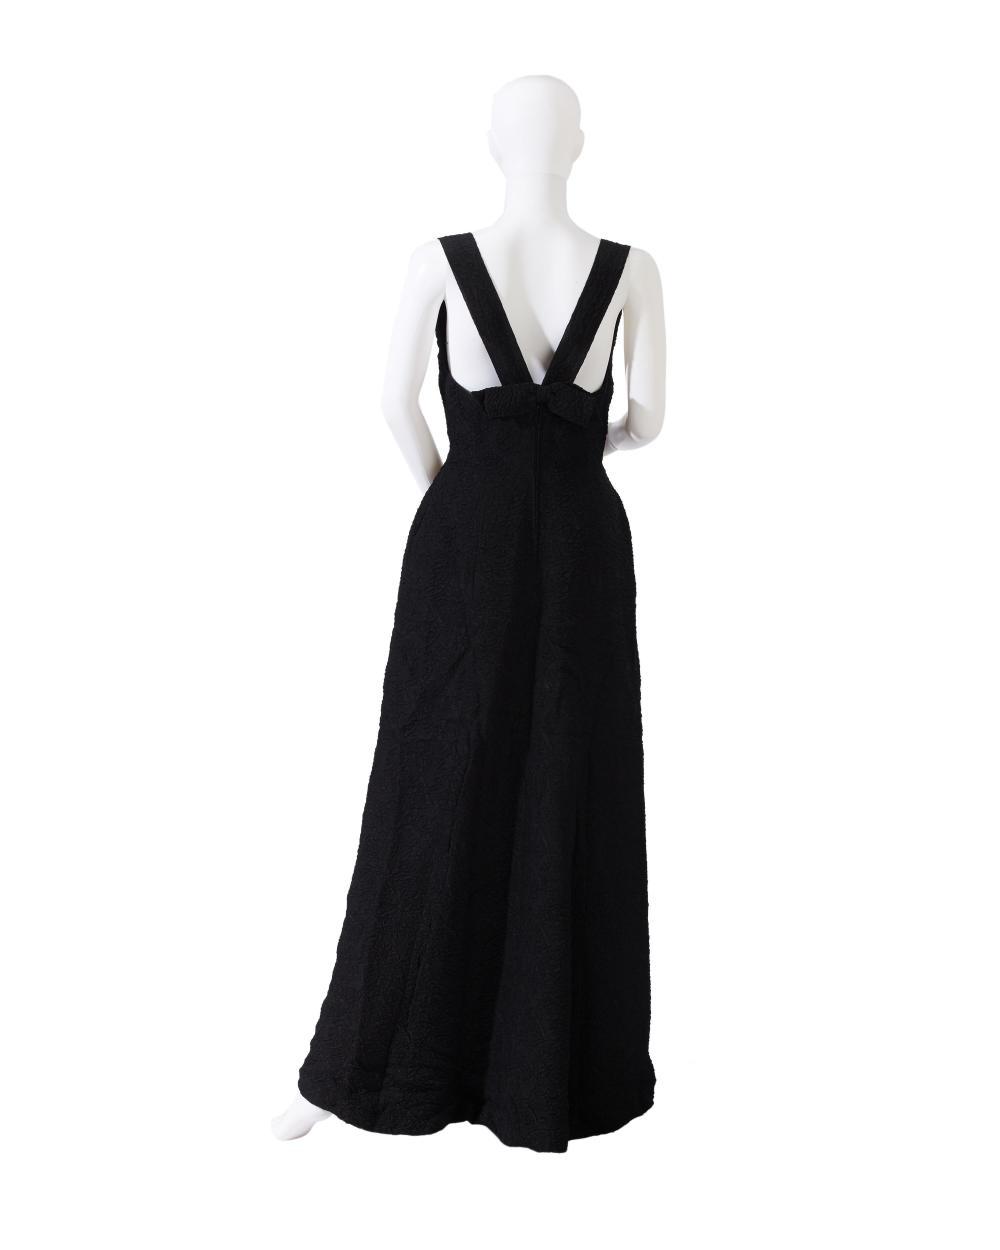 Two Elizabeth Arden sleeveless evening gowns